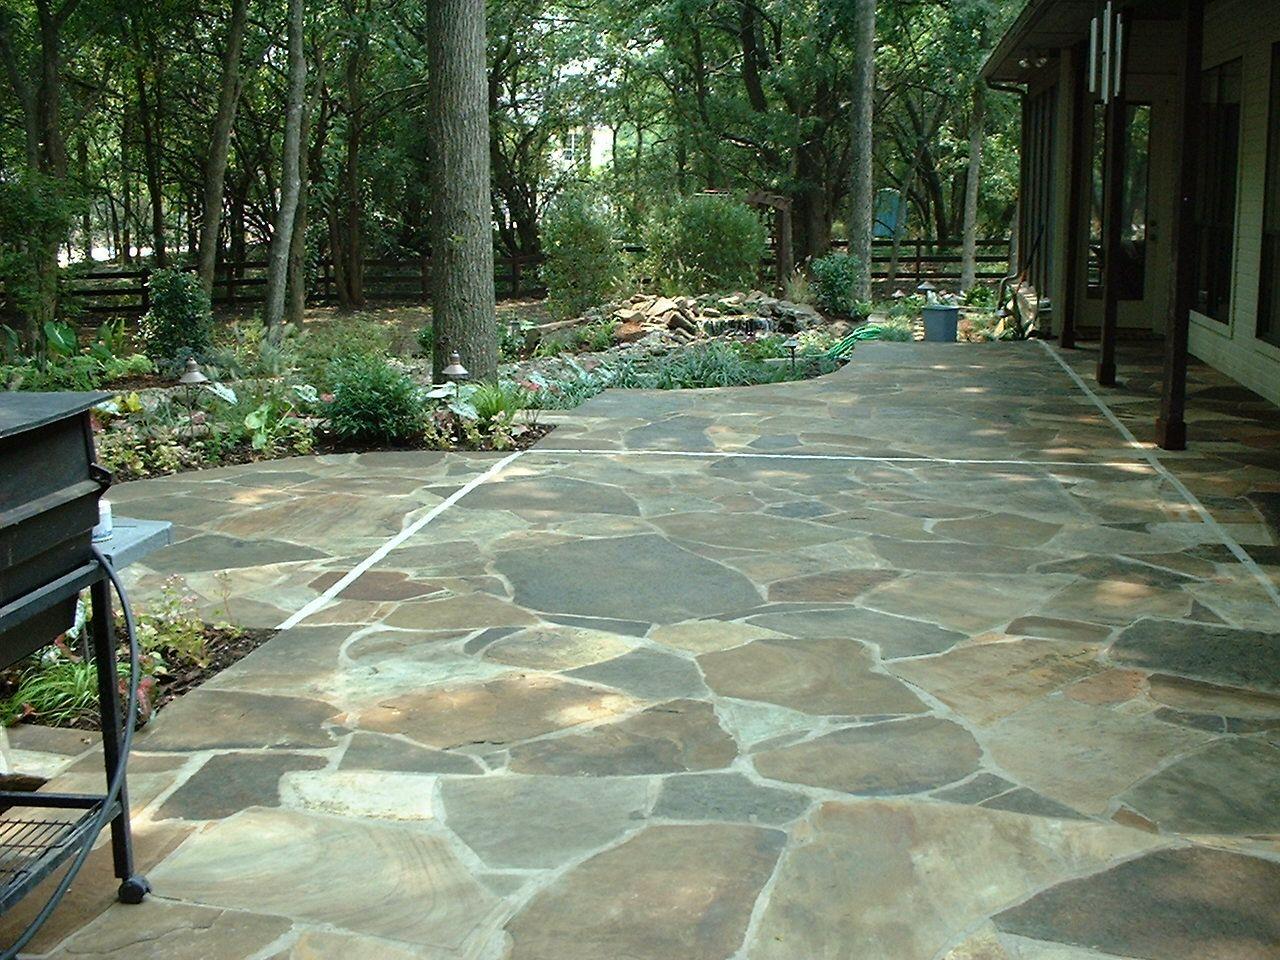 How To Lay A Flagstone Patio Flagstone Patio Design Stone Patio